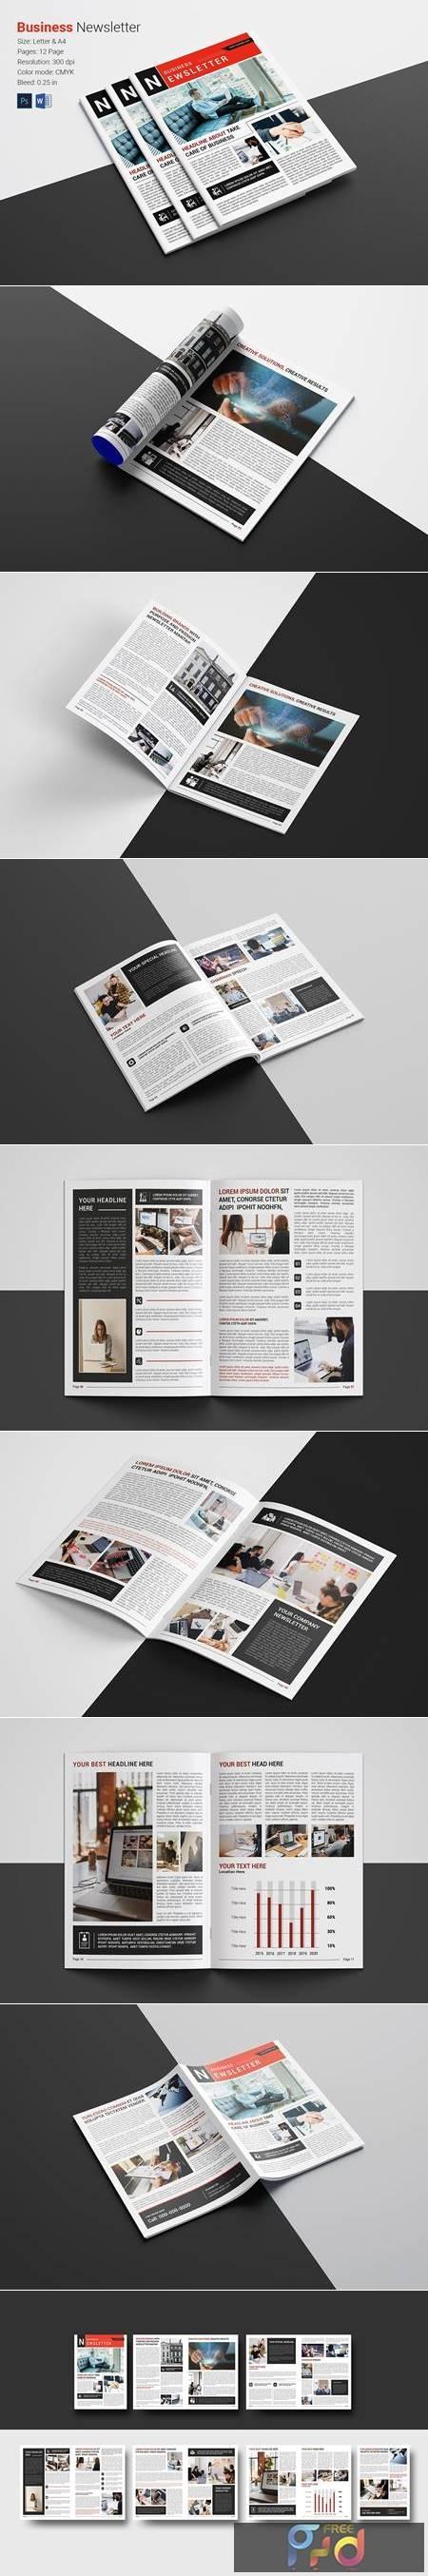 Newsletter Brochure Template 4979586 1